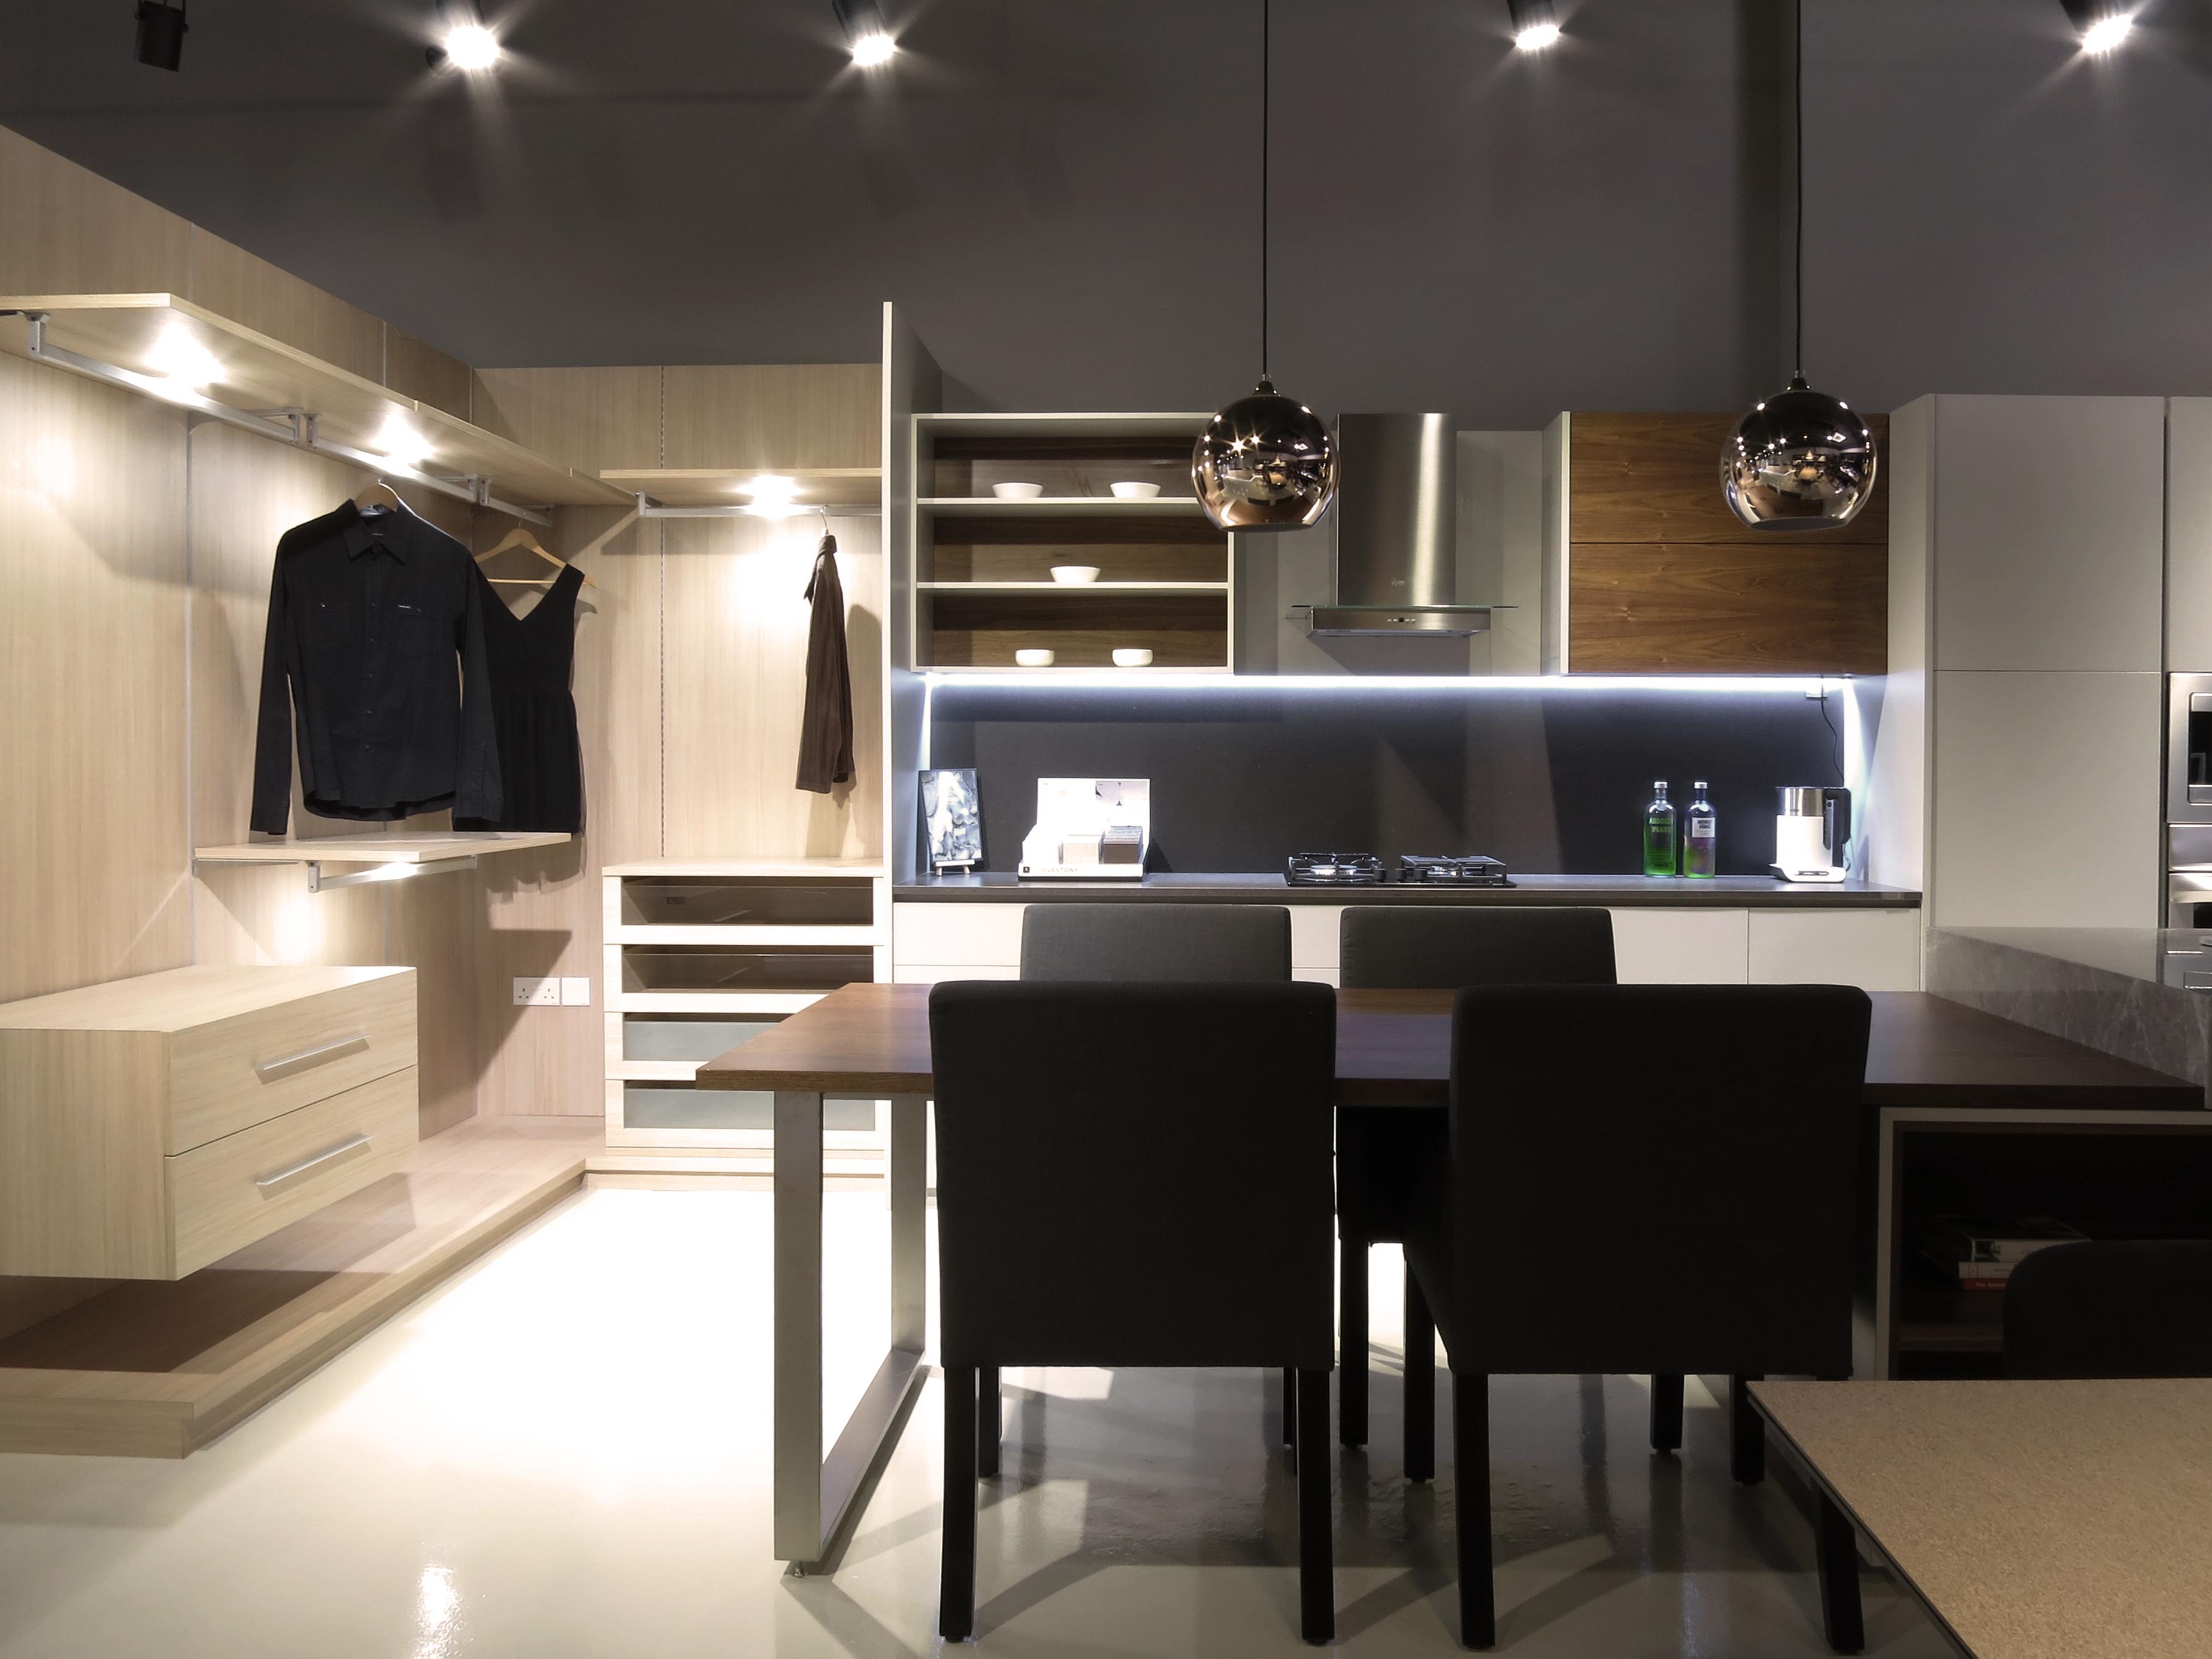 Bluprin id contemporary singapore interior design for Interior design consultancy singapore